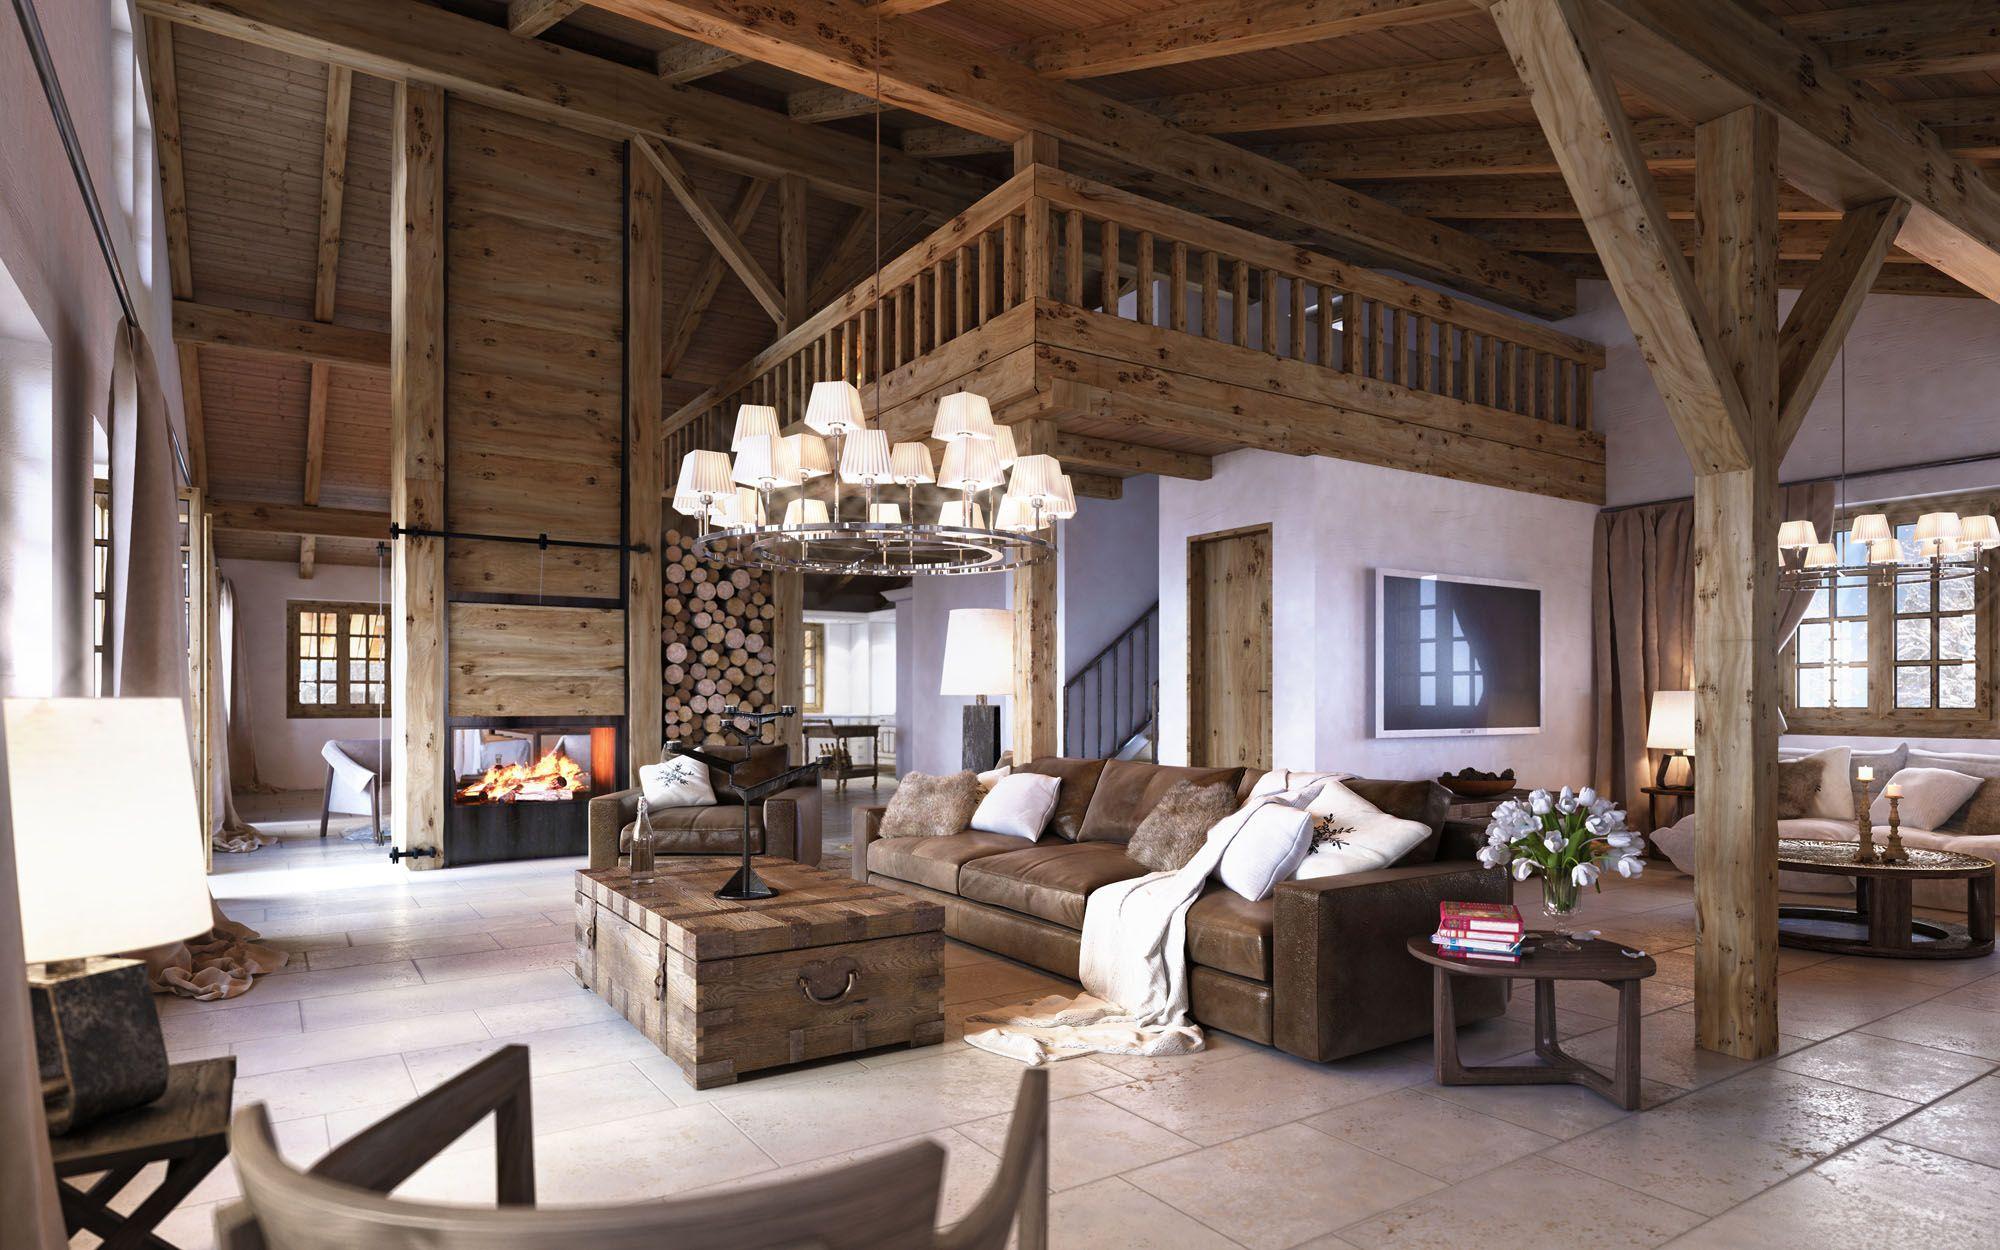 Moderne Innovative Luxus Interieur Ideen Furs Wohnzimmer Winterhaus Design